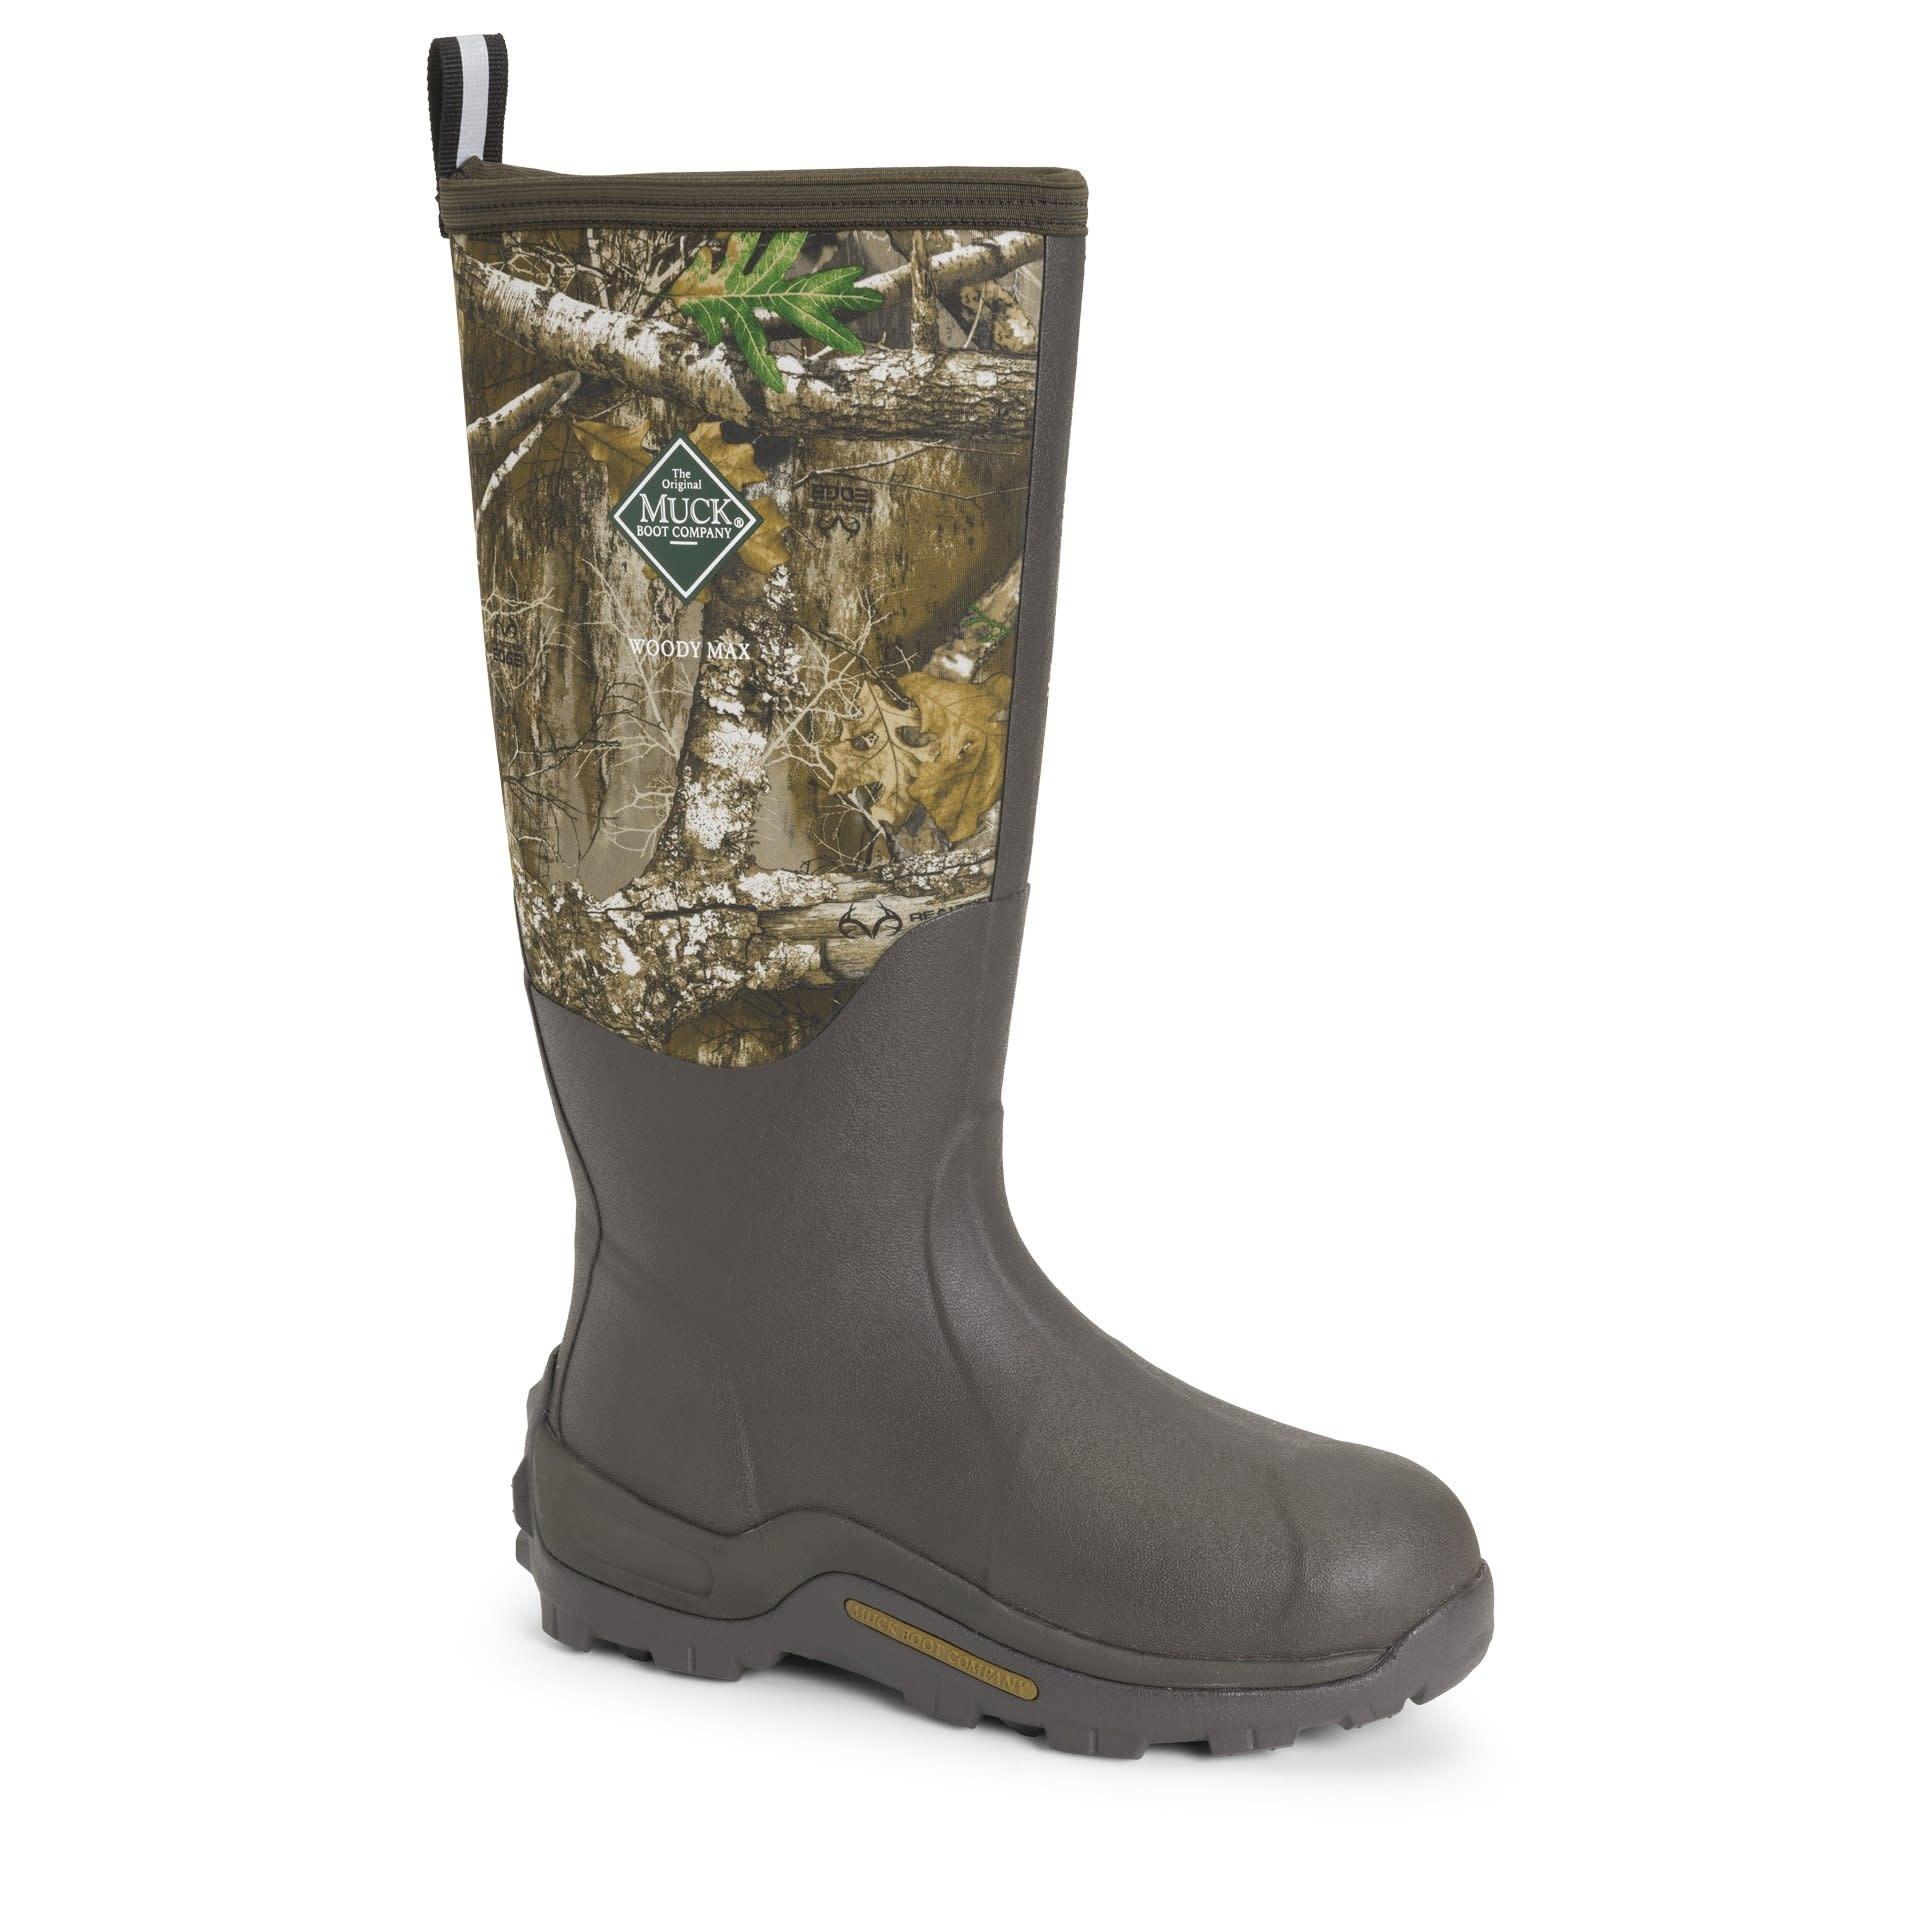 Muck Muck Men's Woody Max Boots